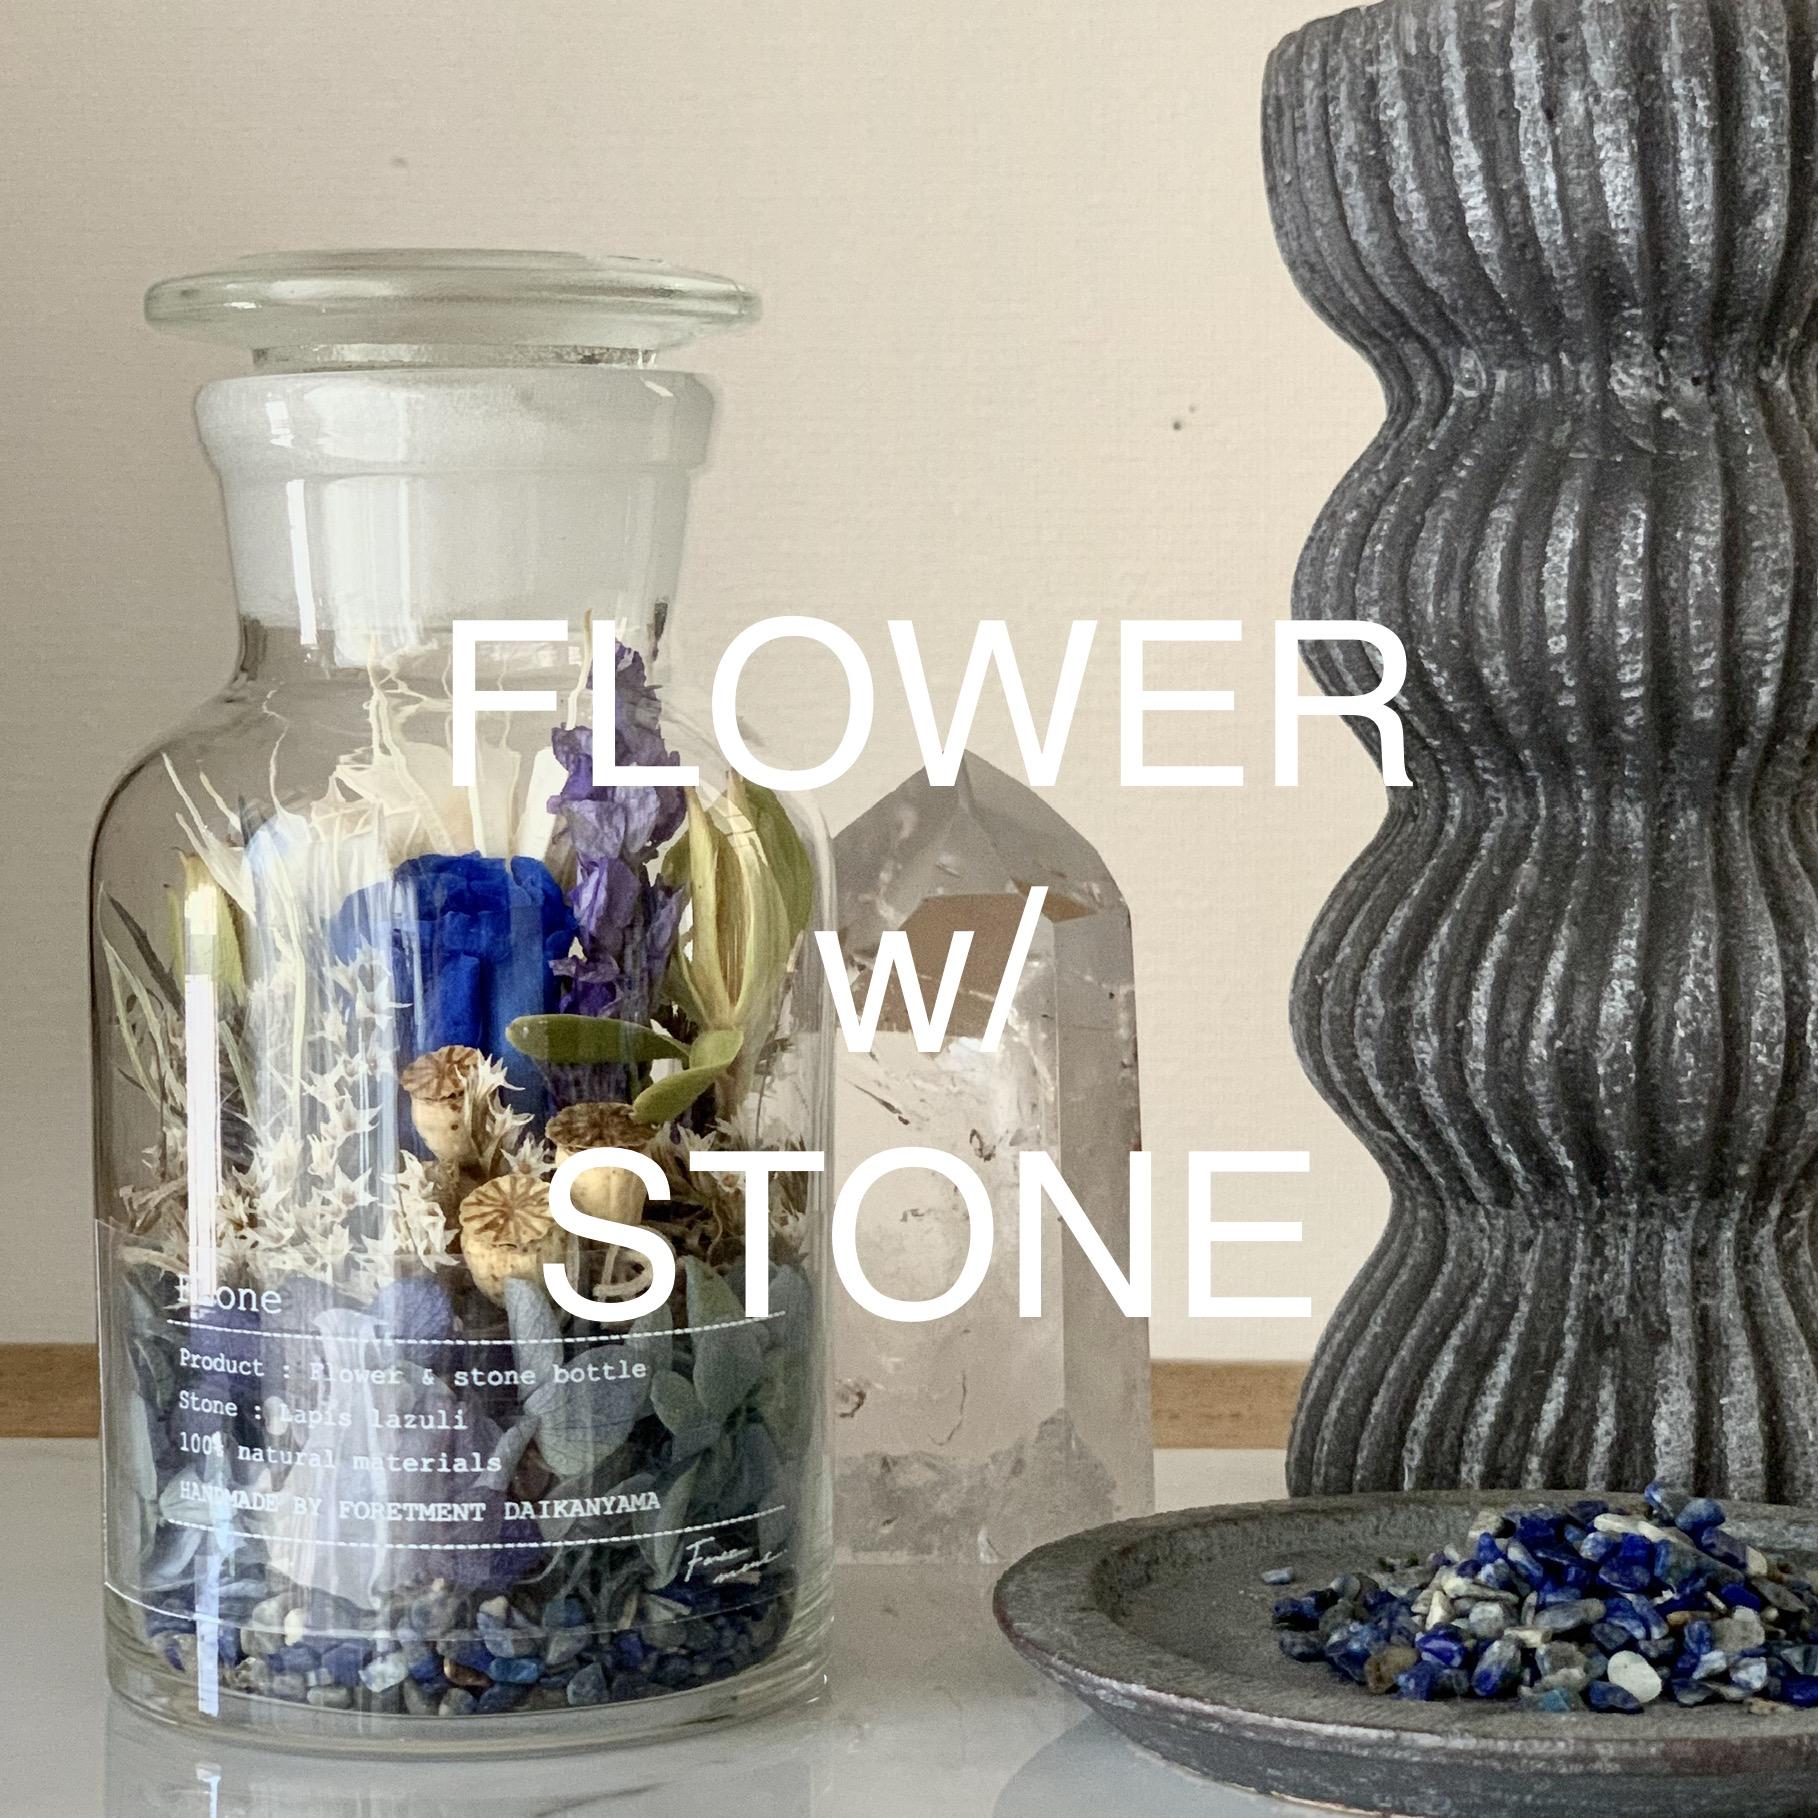 foretment(スプレイ)商品画像Floneflowerbottle-L